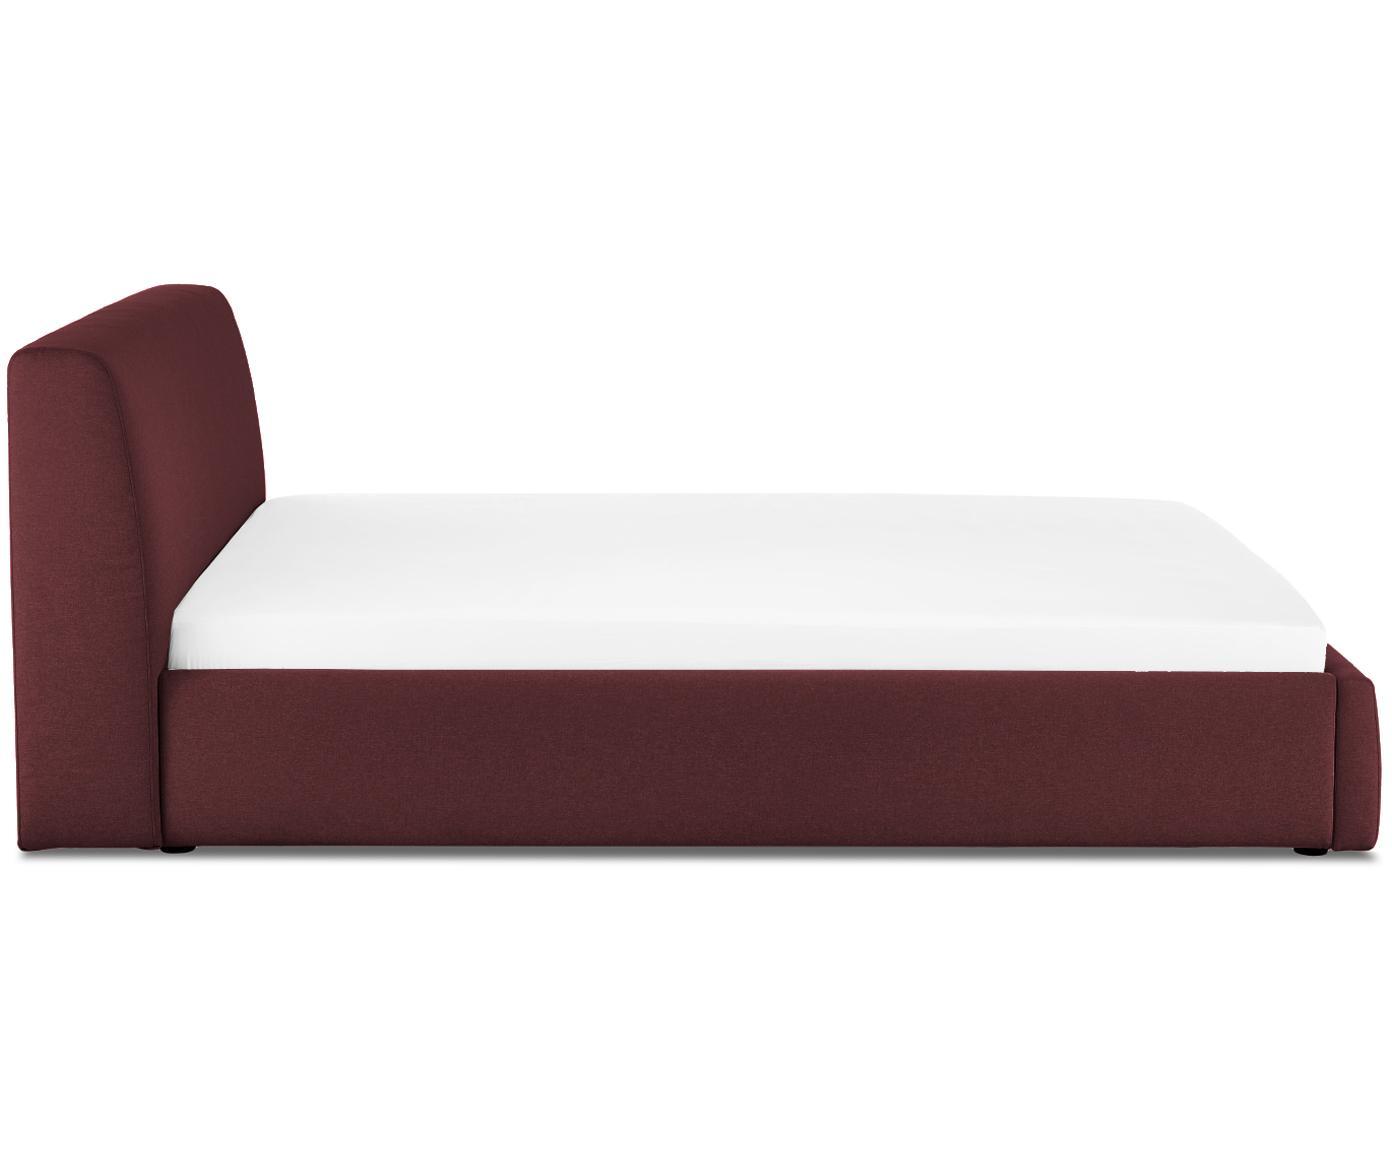 Gestoffeerd bed Cloud, Frame: massief grenenhout, Bekleding: polyester (structuurstof), Bordeauxrood, 180 x 200 cm